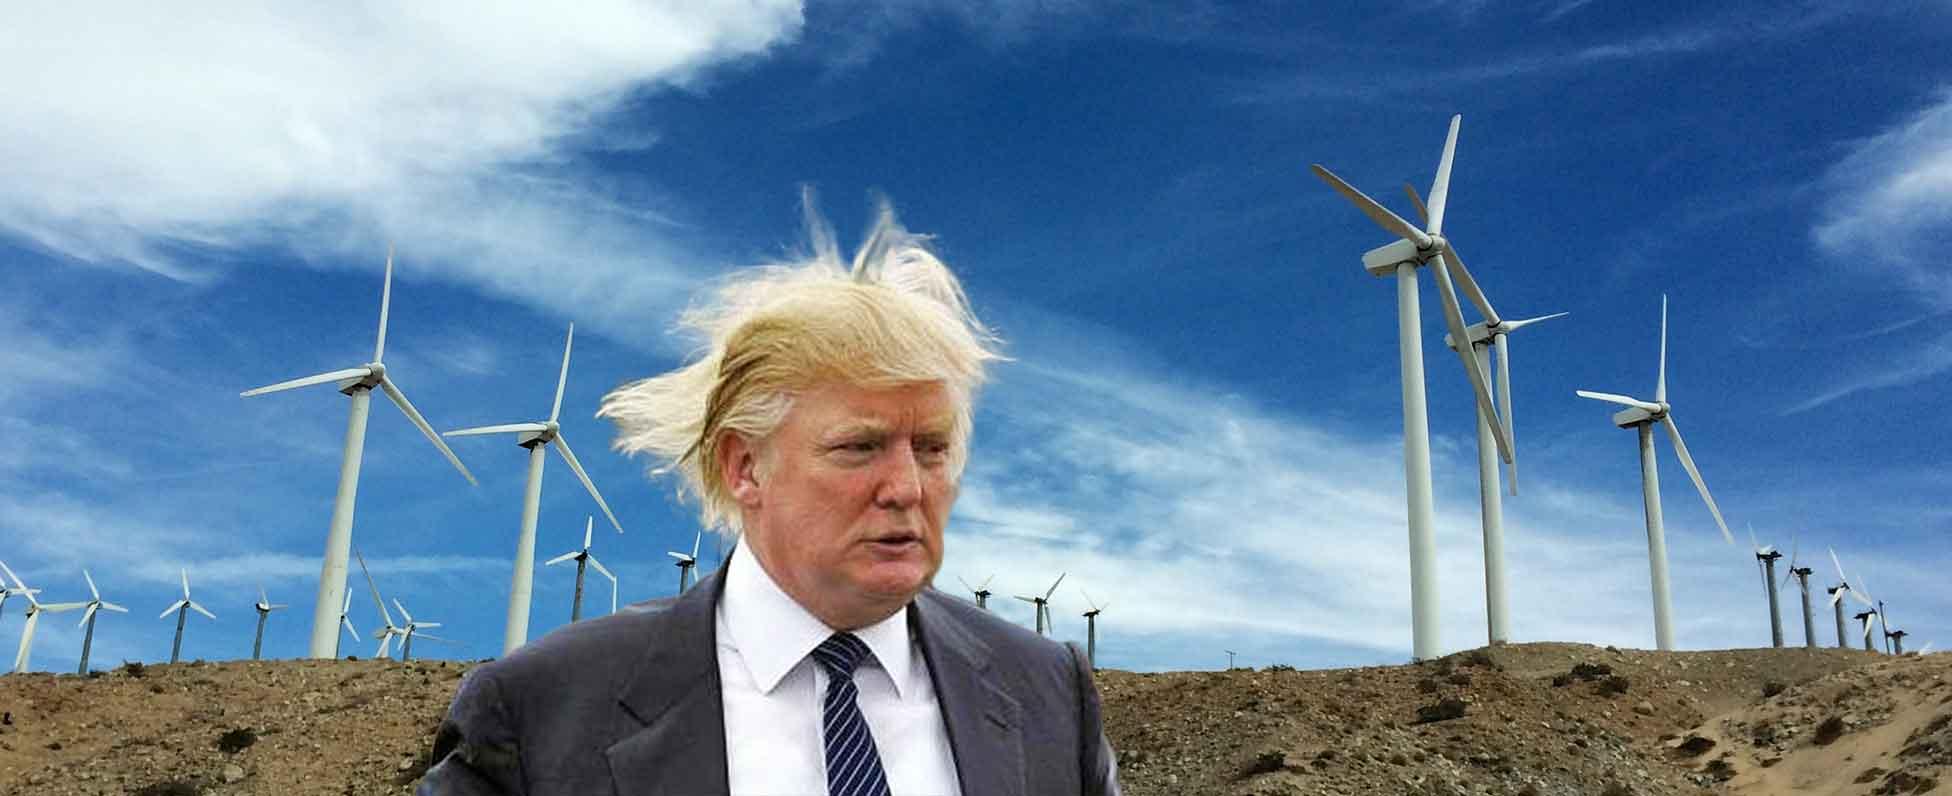 trump-wind-energy